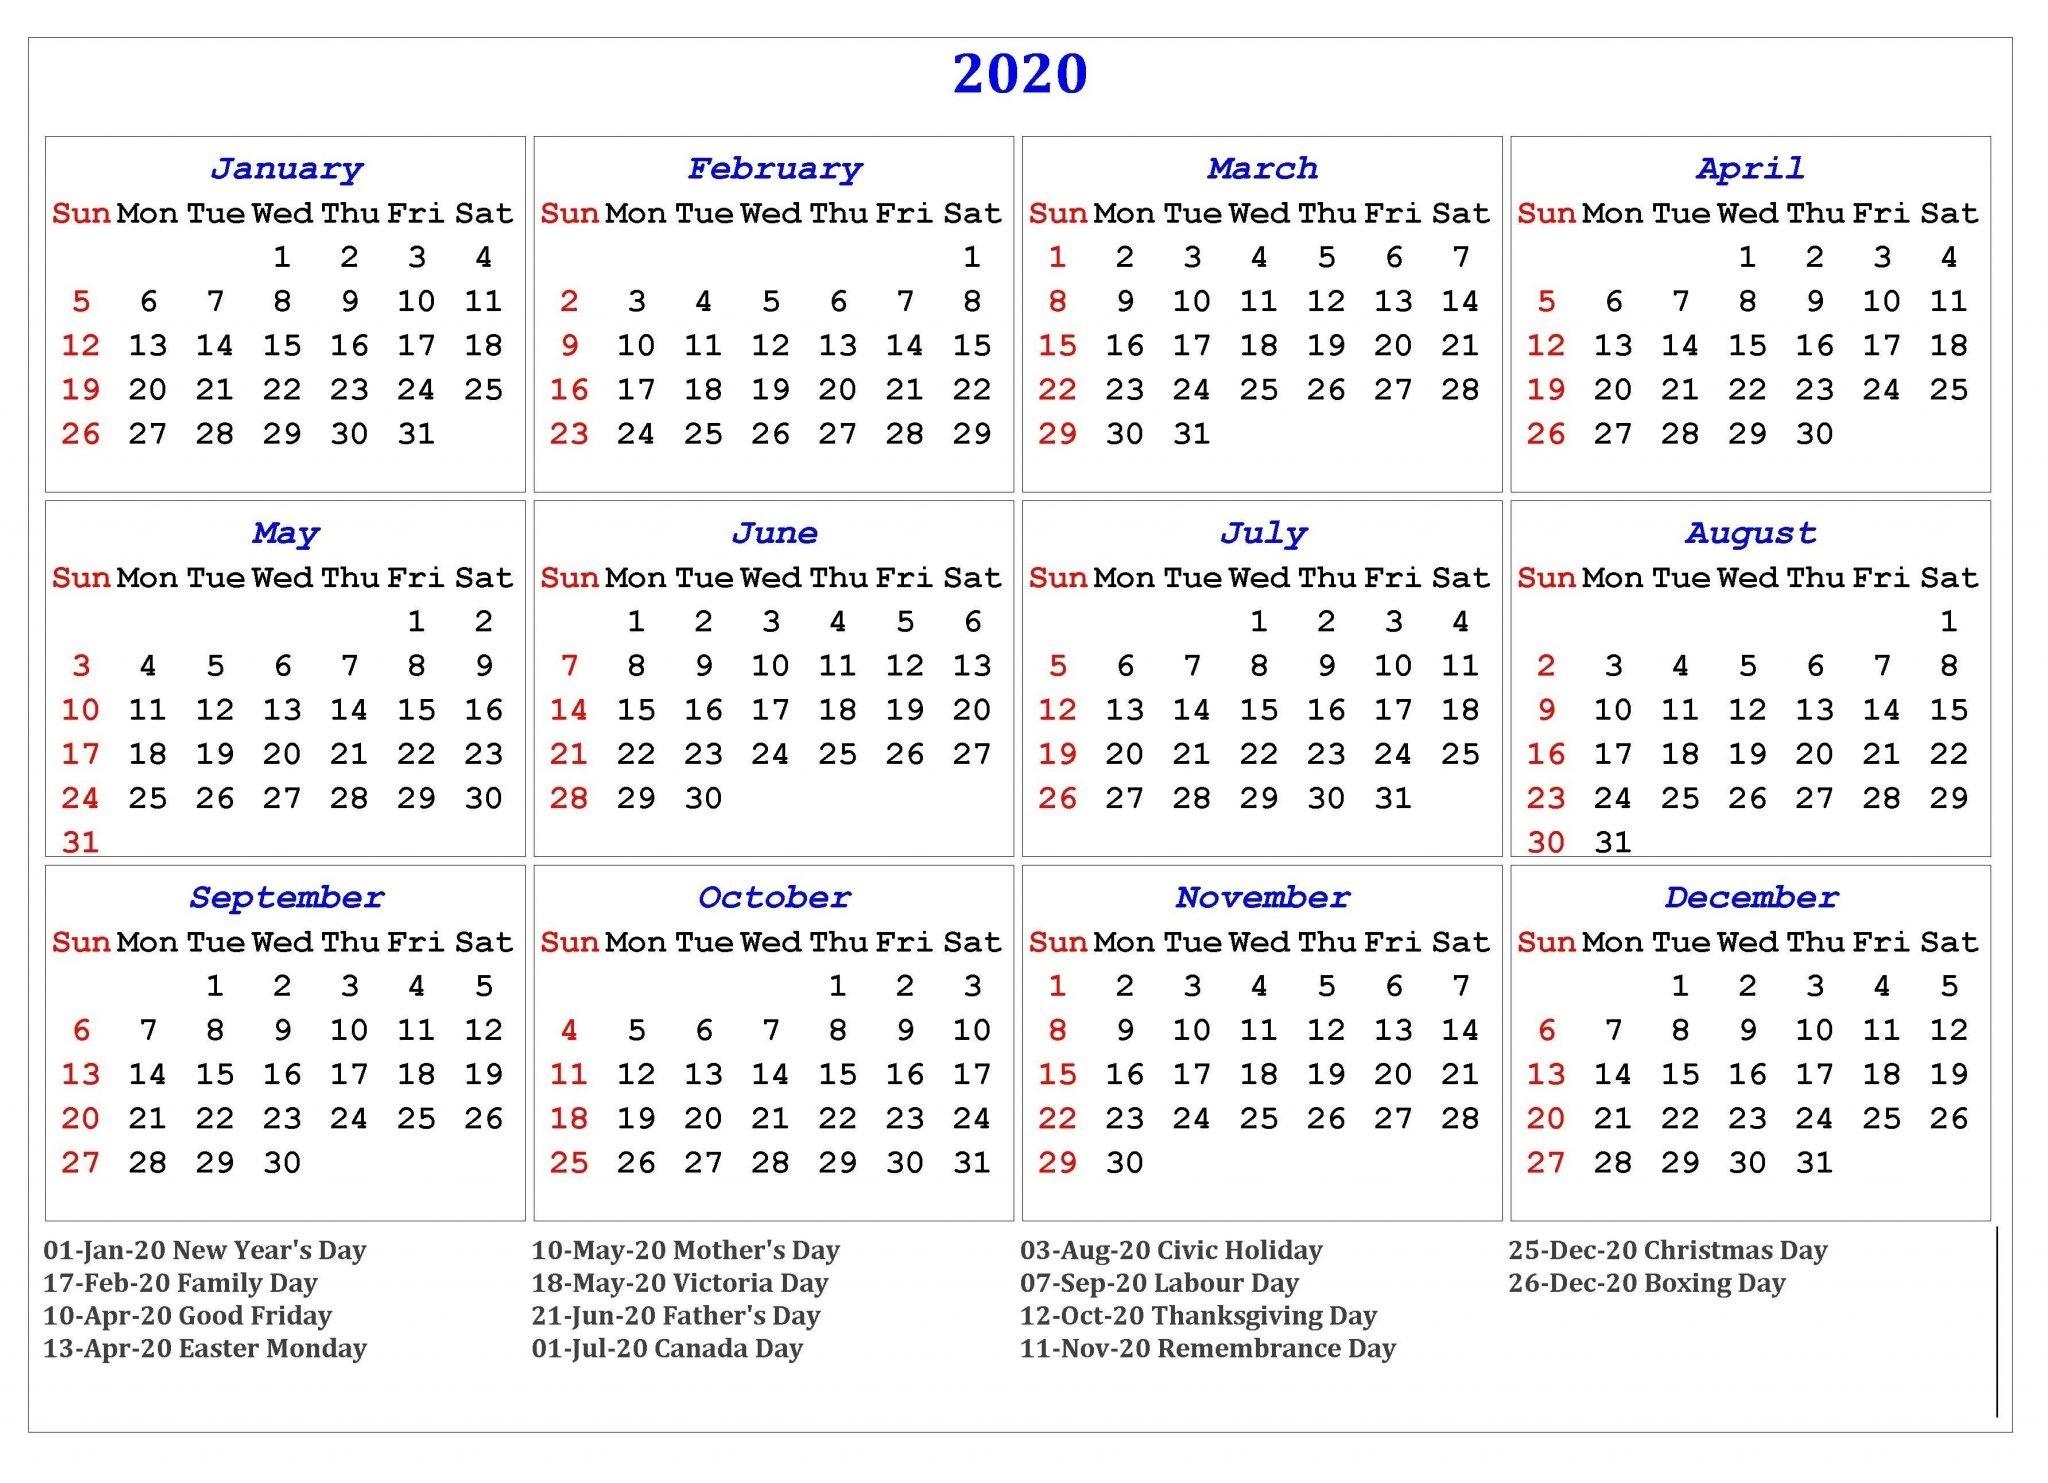 Monday To Sunday Blank Calendar 2020 With Holidays